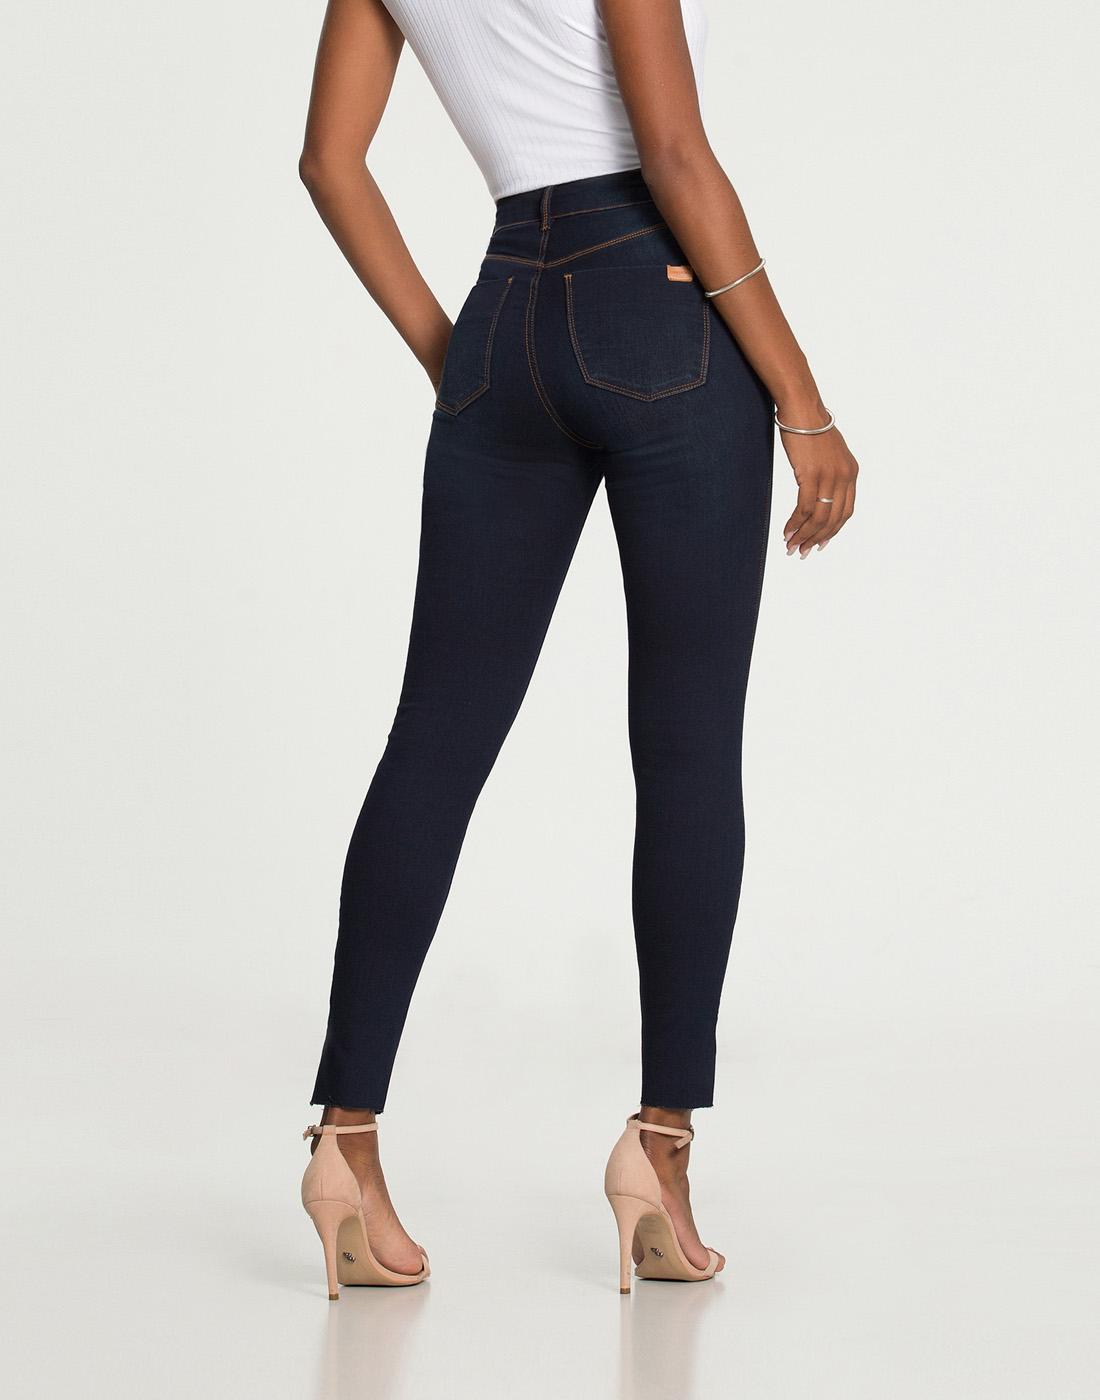 Calça Skinny Cropped Fit For Me Jeans Lunender